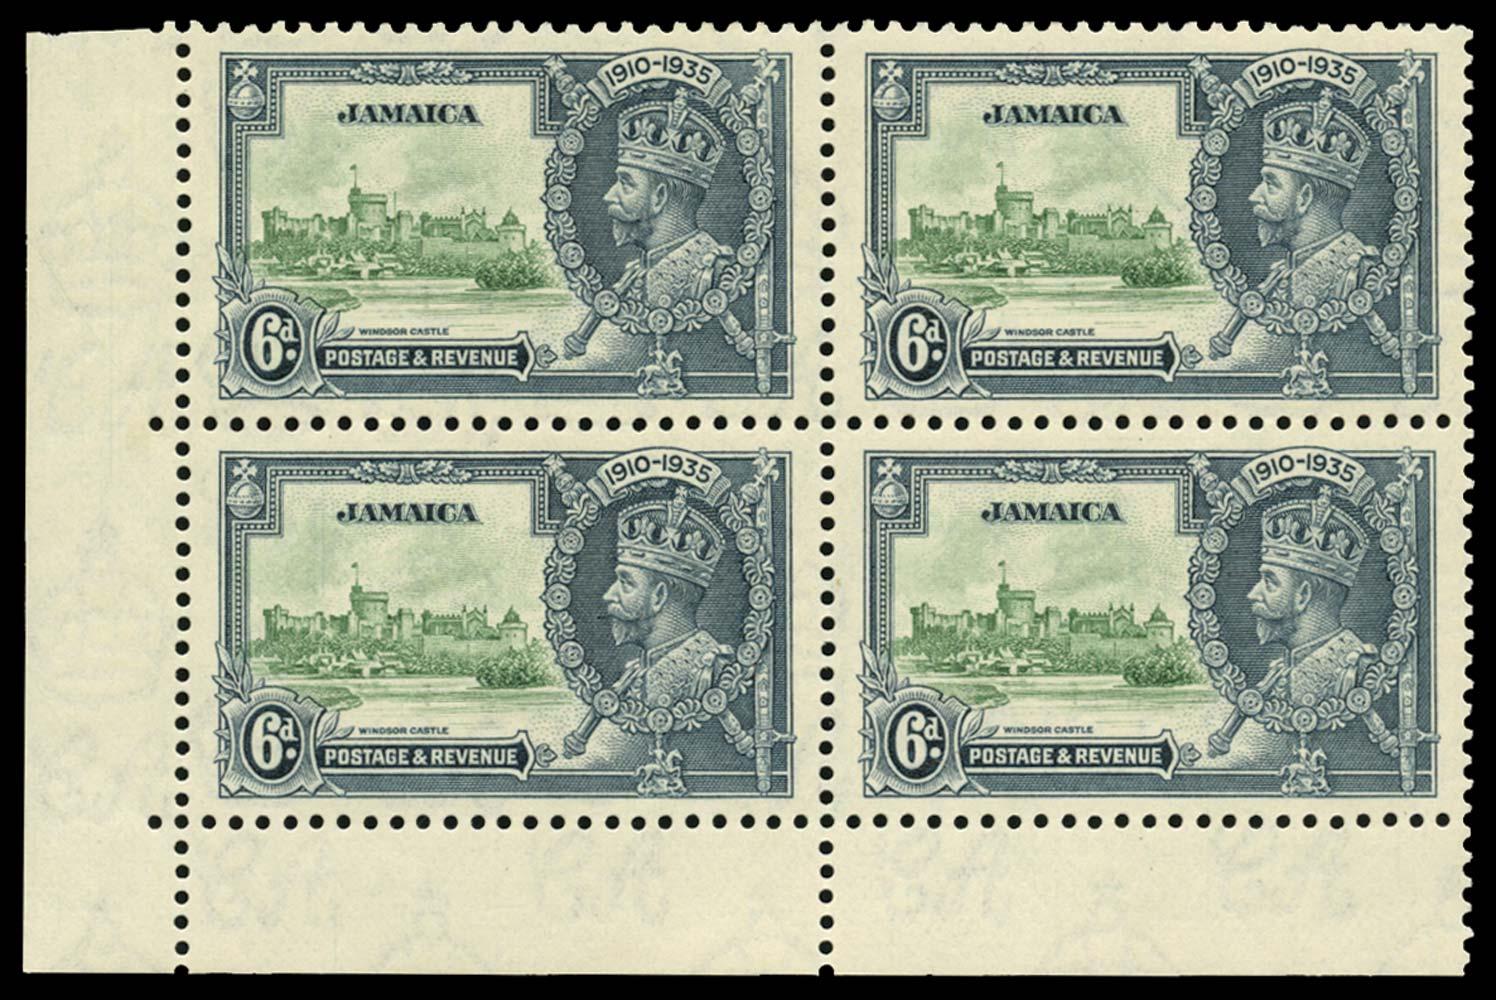 JAMAICA 1935  SG116/a Mint